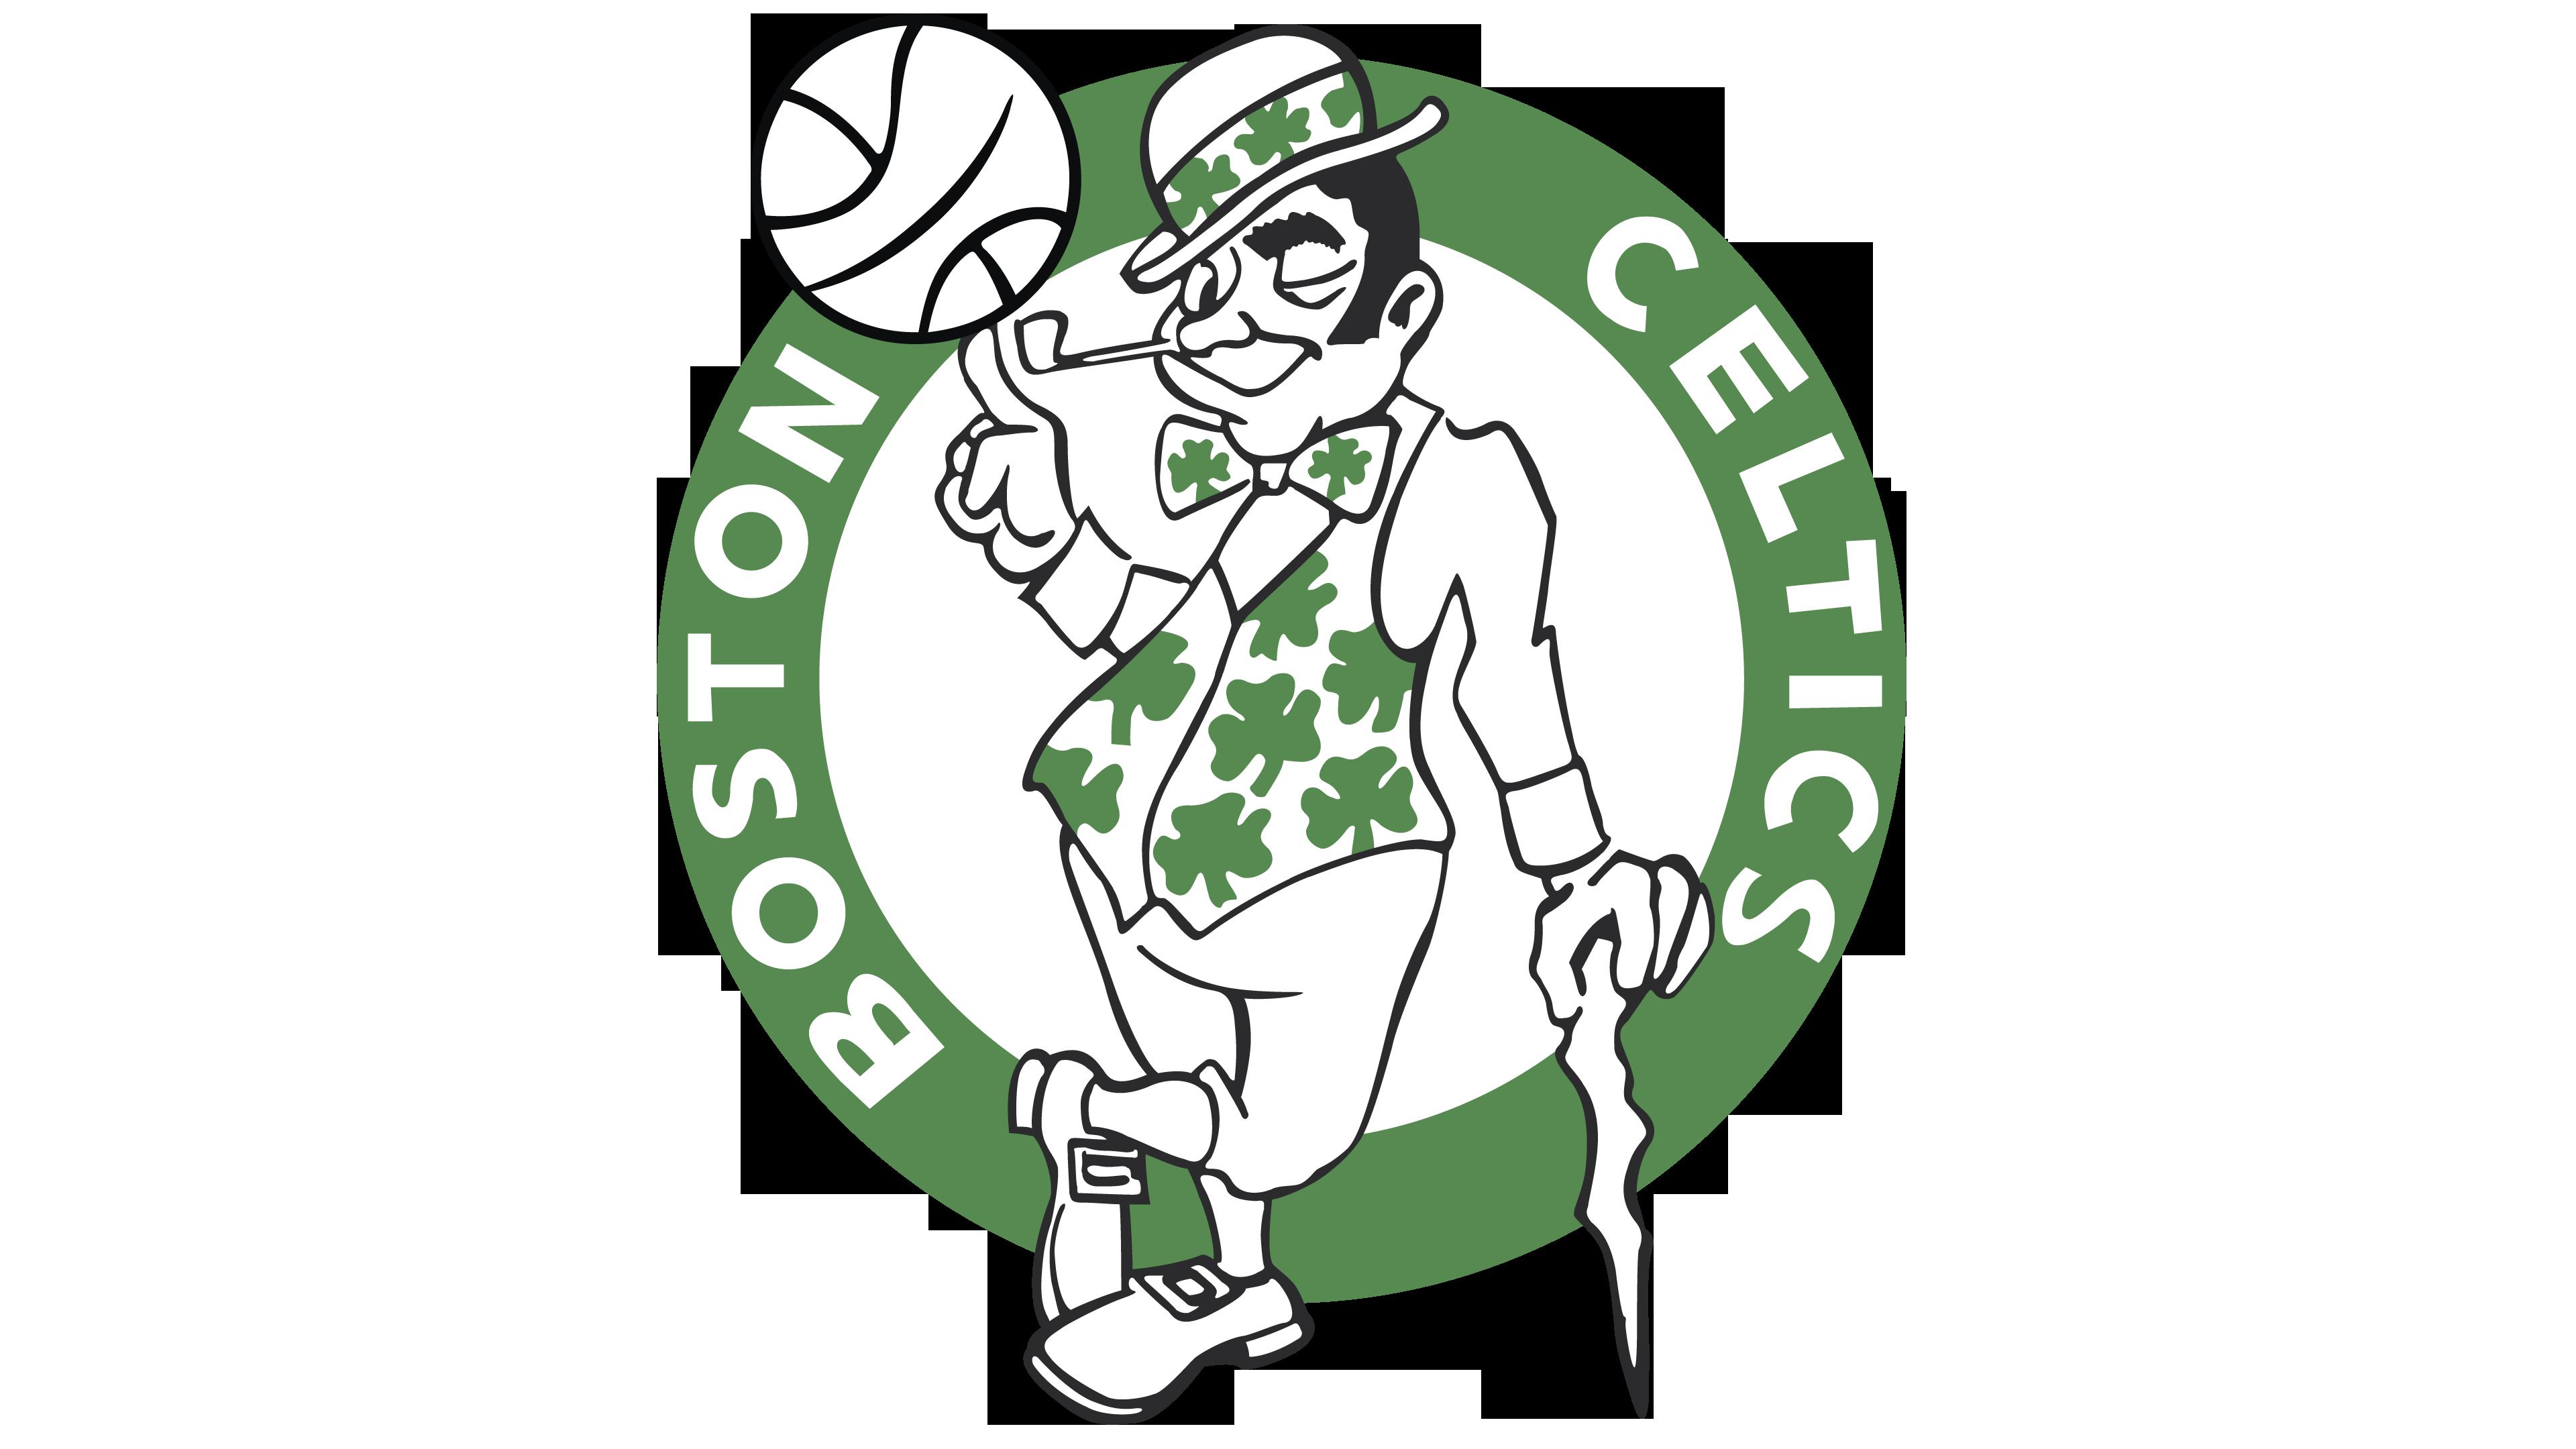 Boston celtics basketball clipart clip art royalty free stock Boston Celtics Logo - Interesting History of the Team Name and emblem clip art royalty free stock